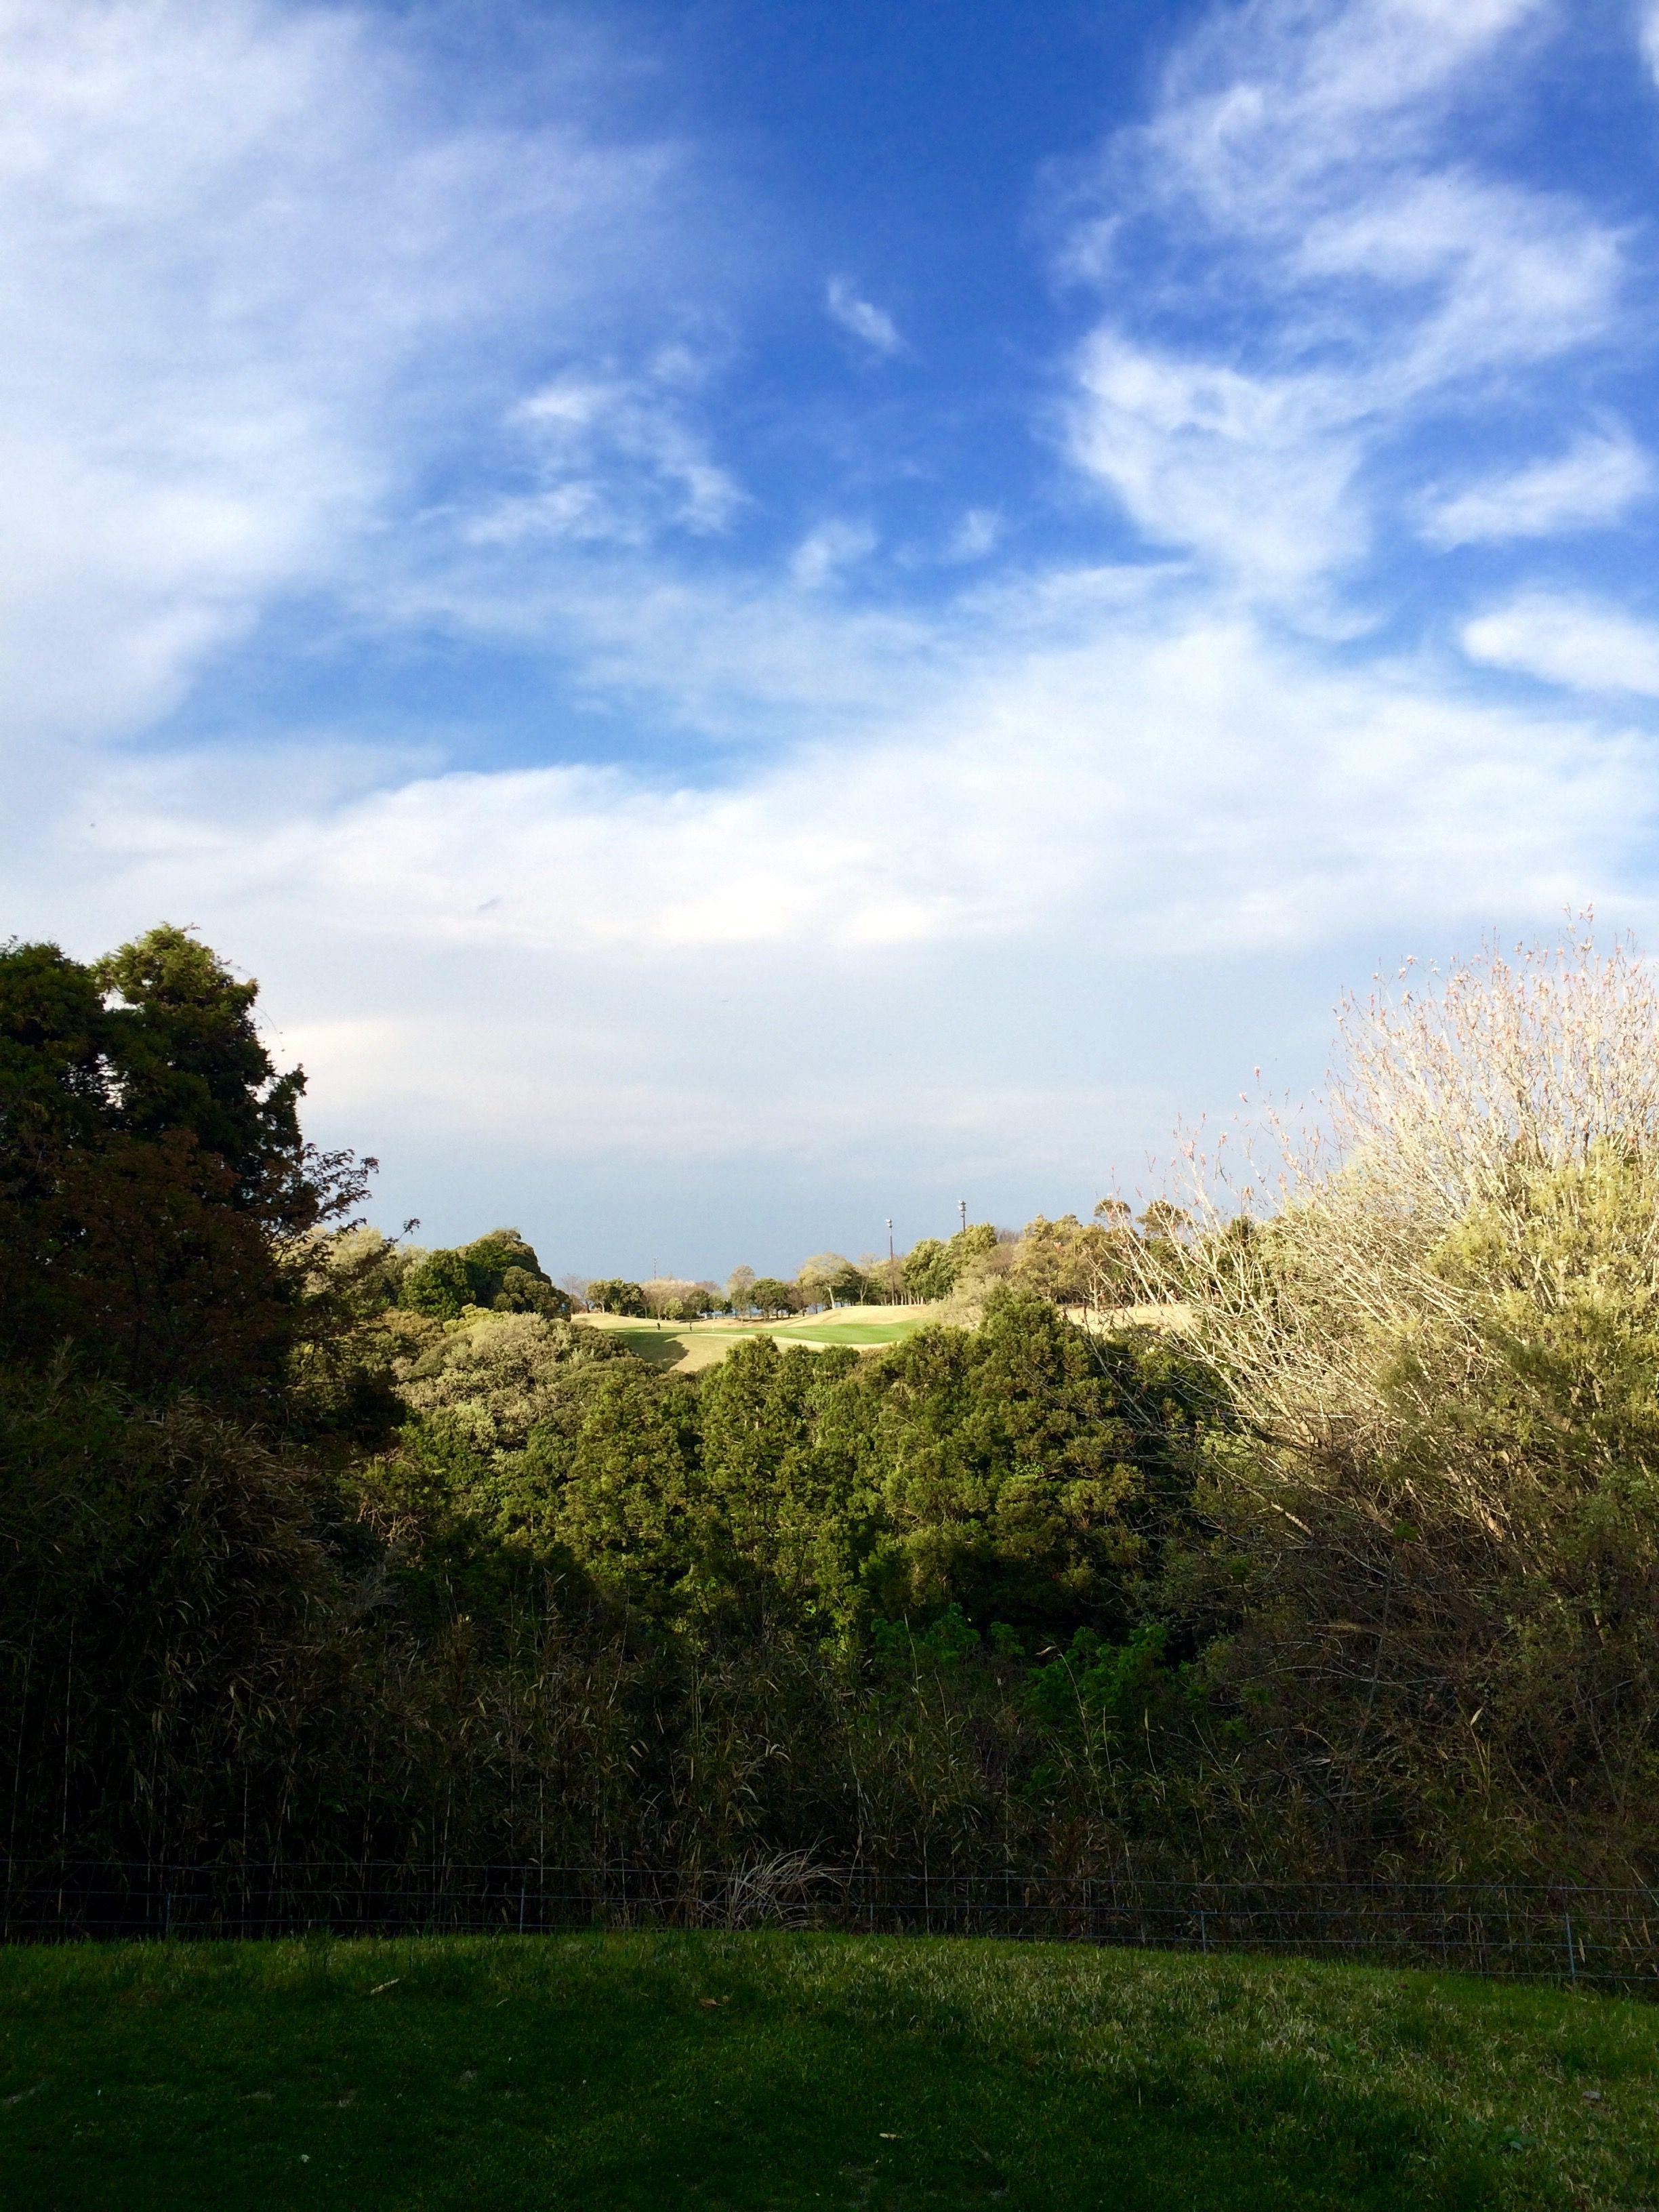 Moonlake Golf Club Ichihara Course Chiba